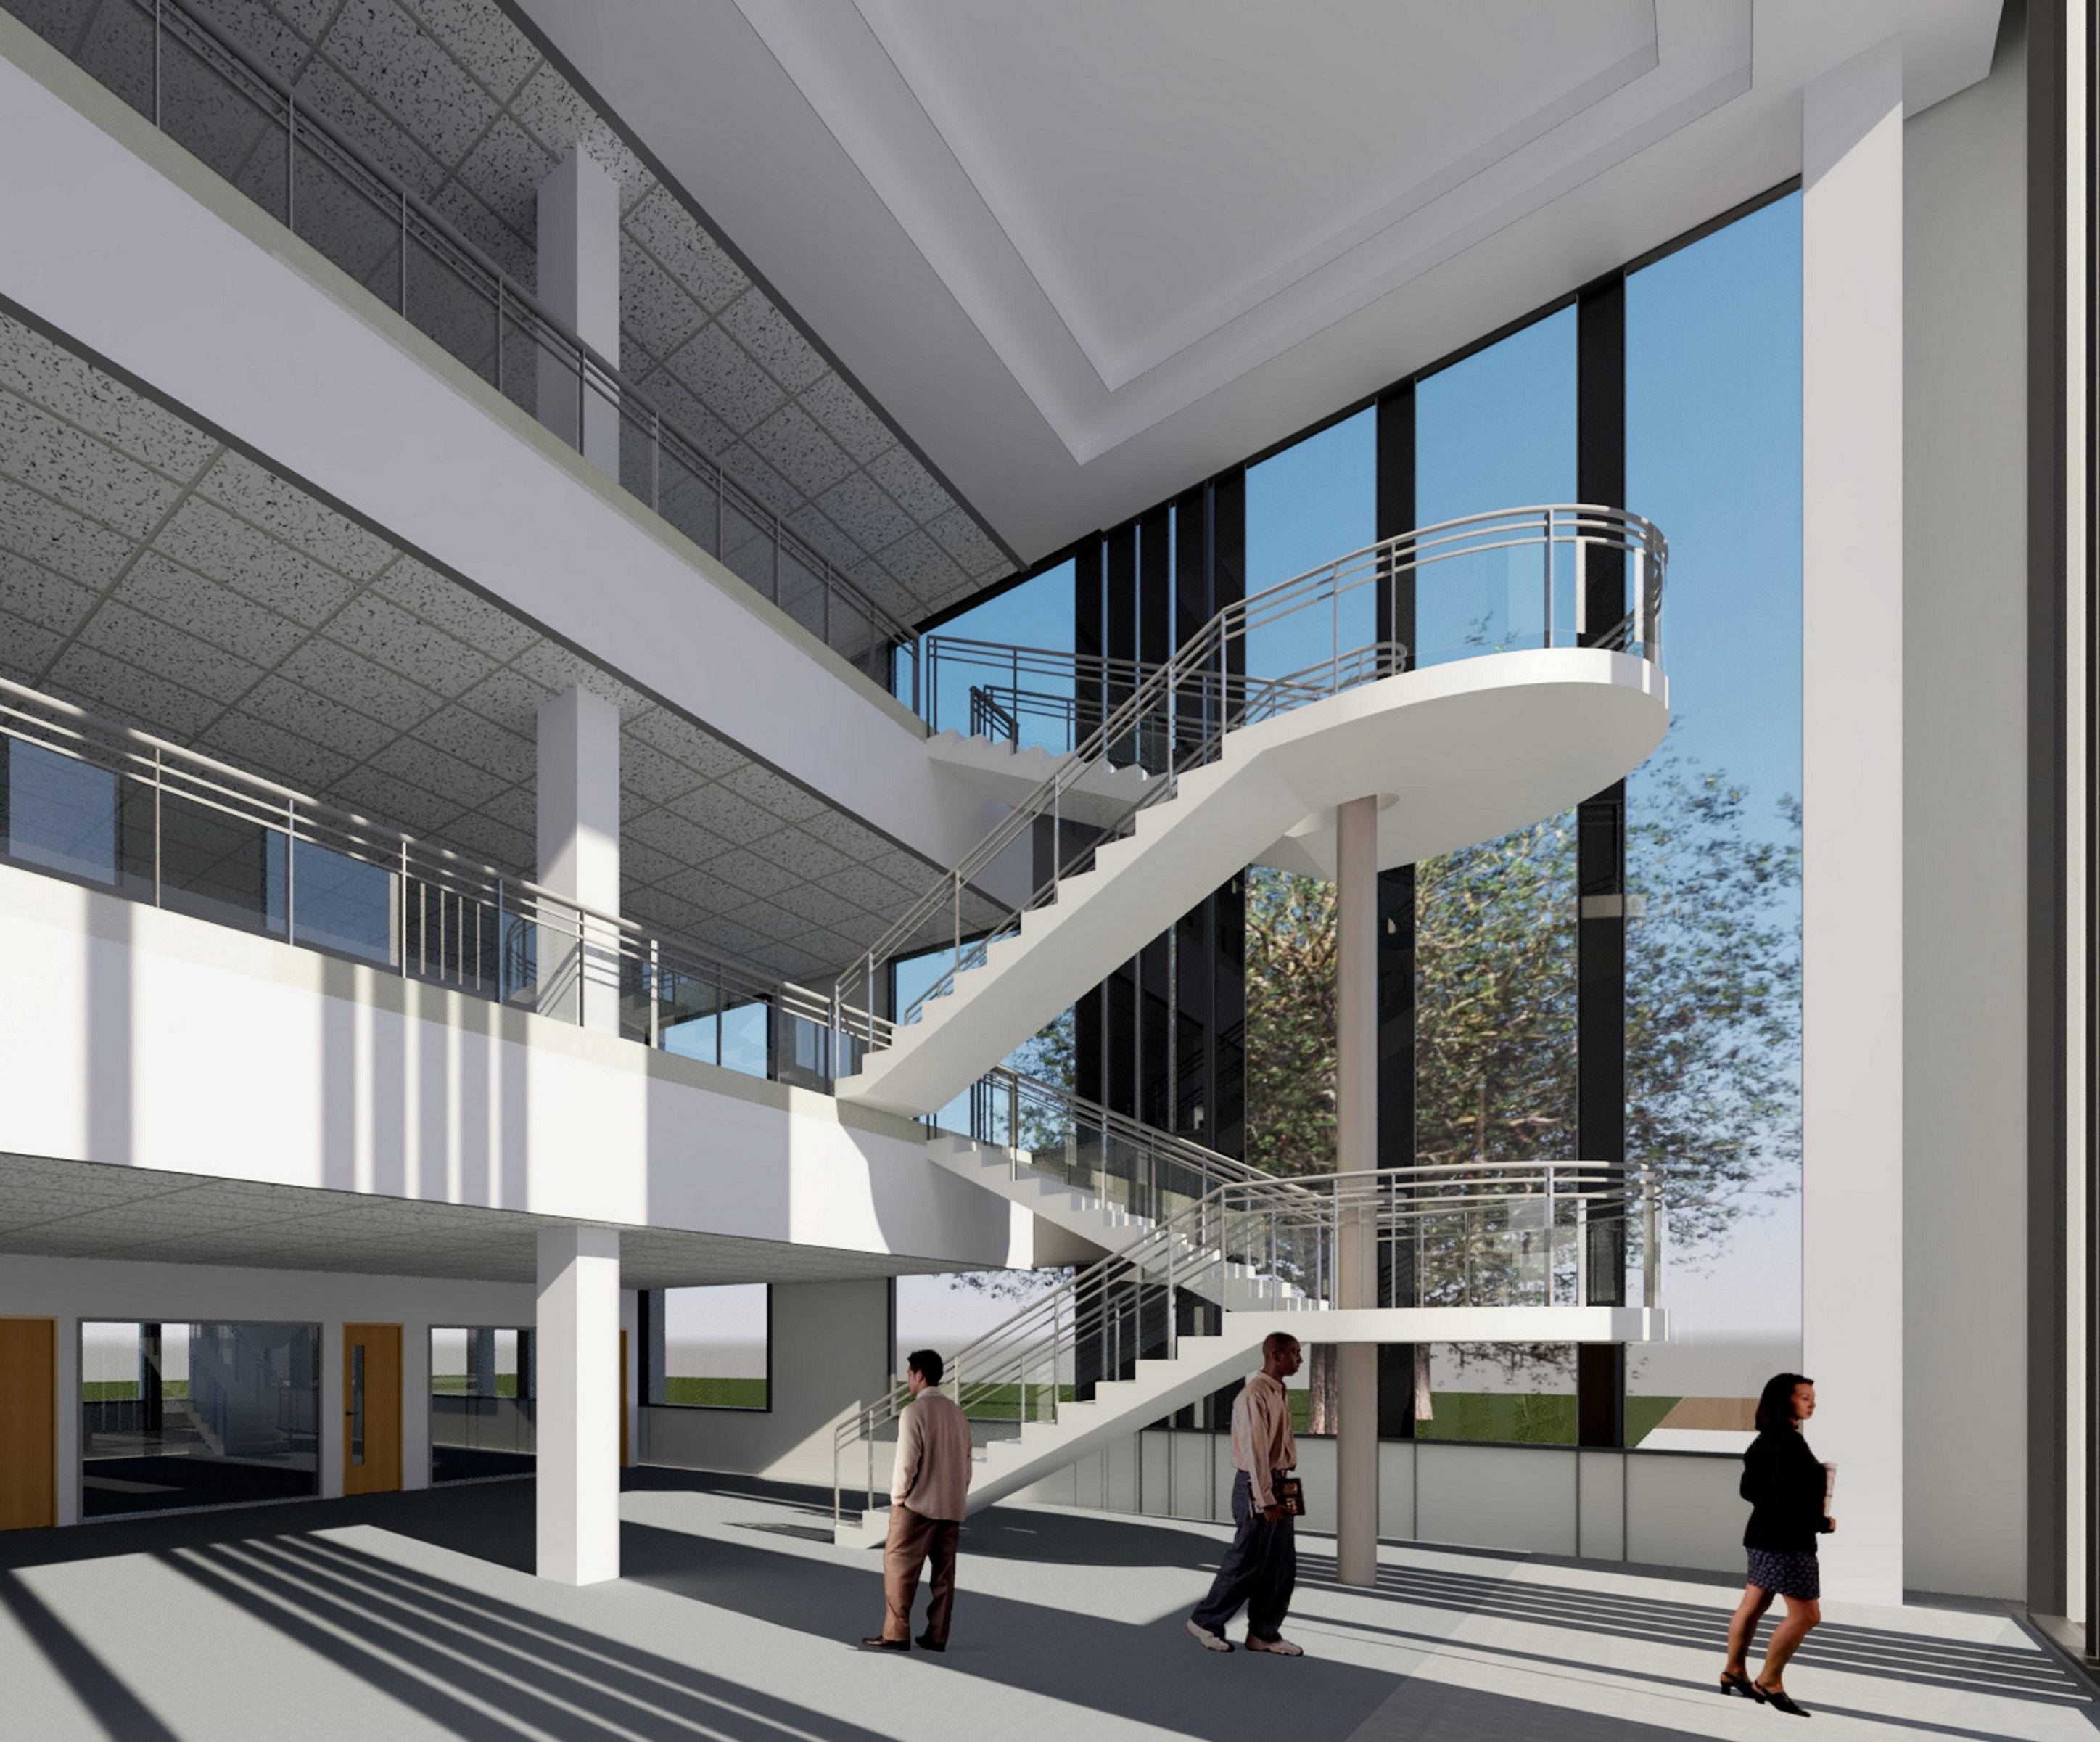 Siemens Mobility innovation centre interior